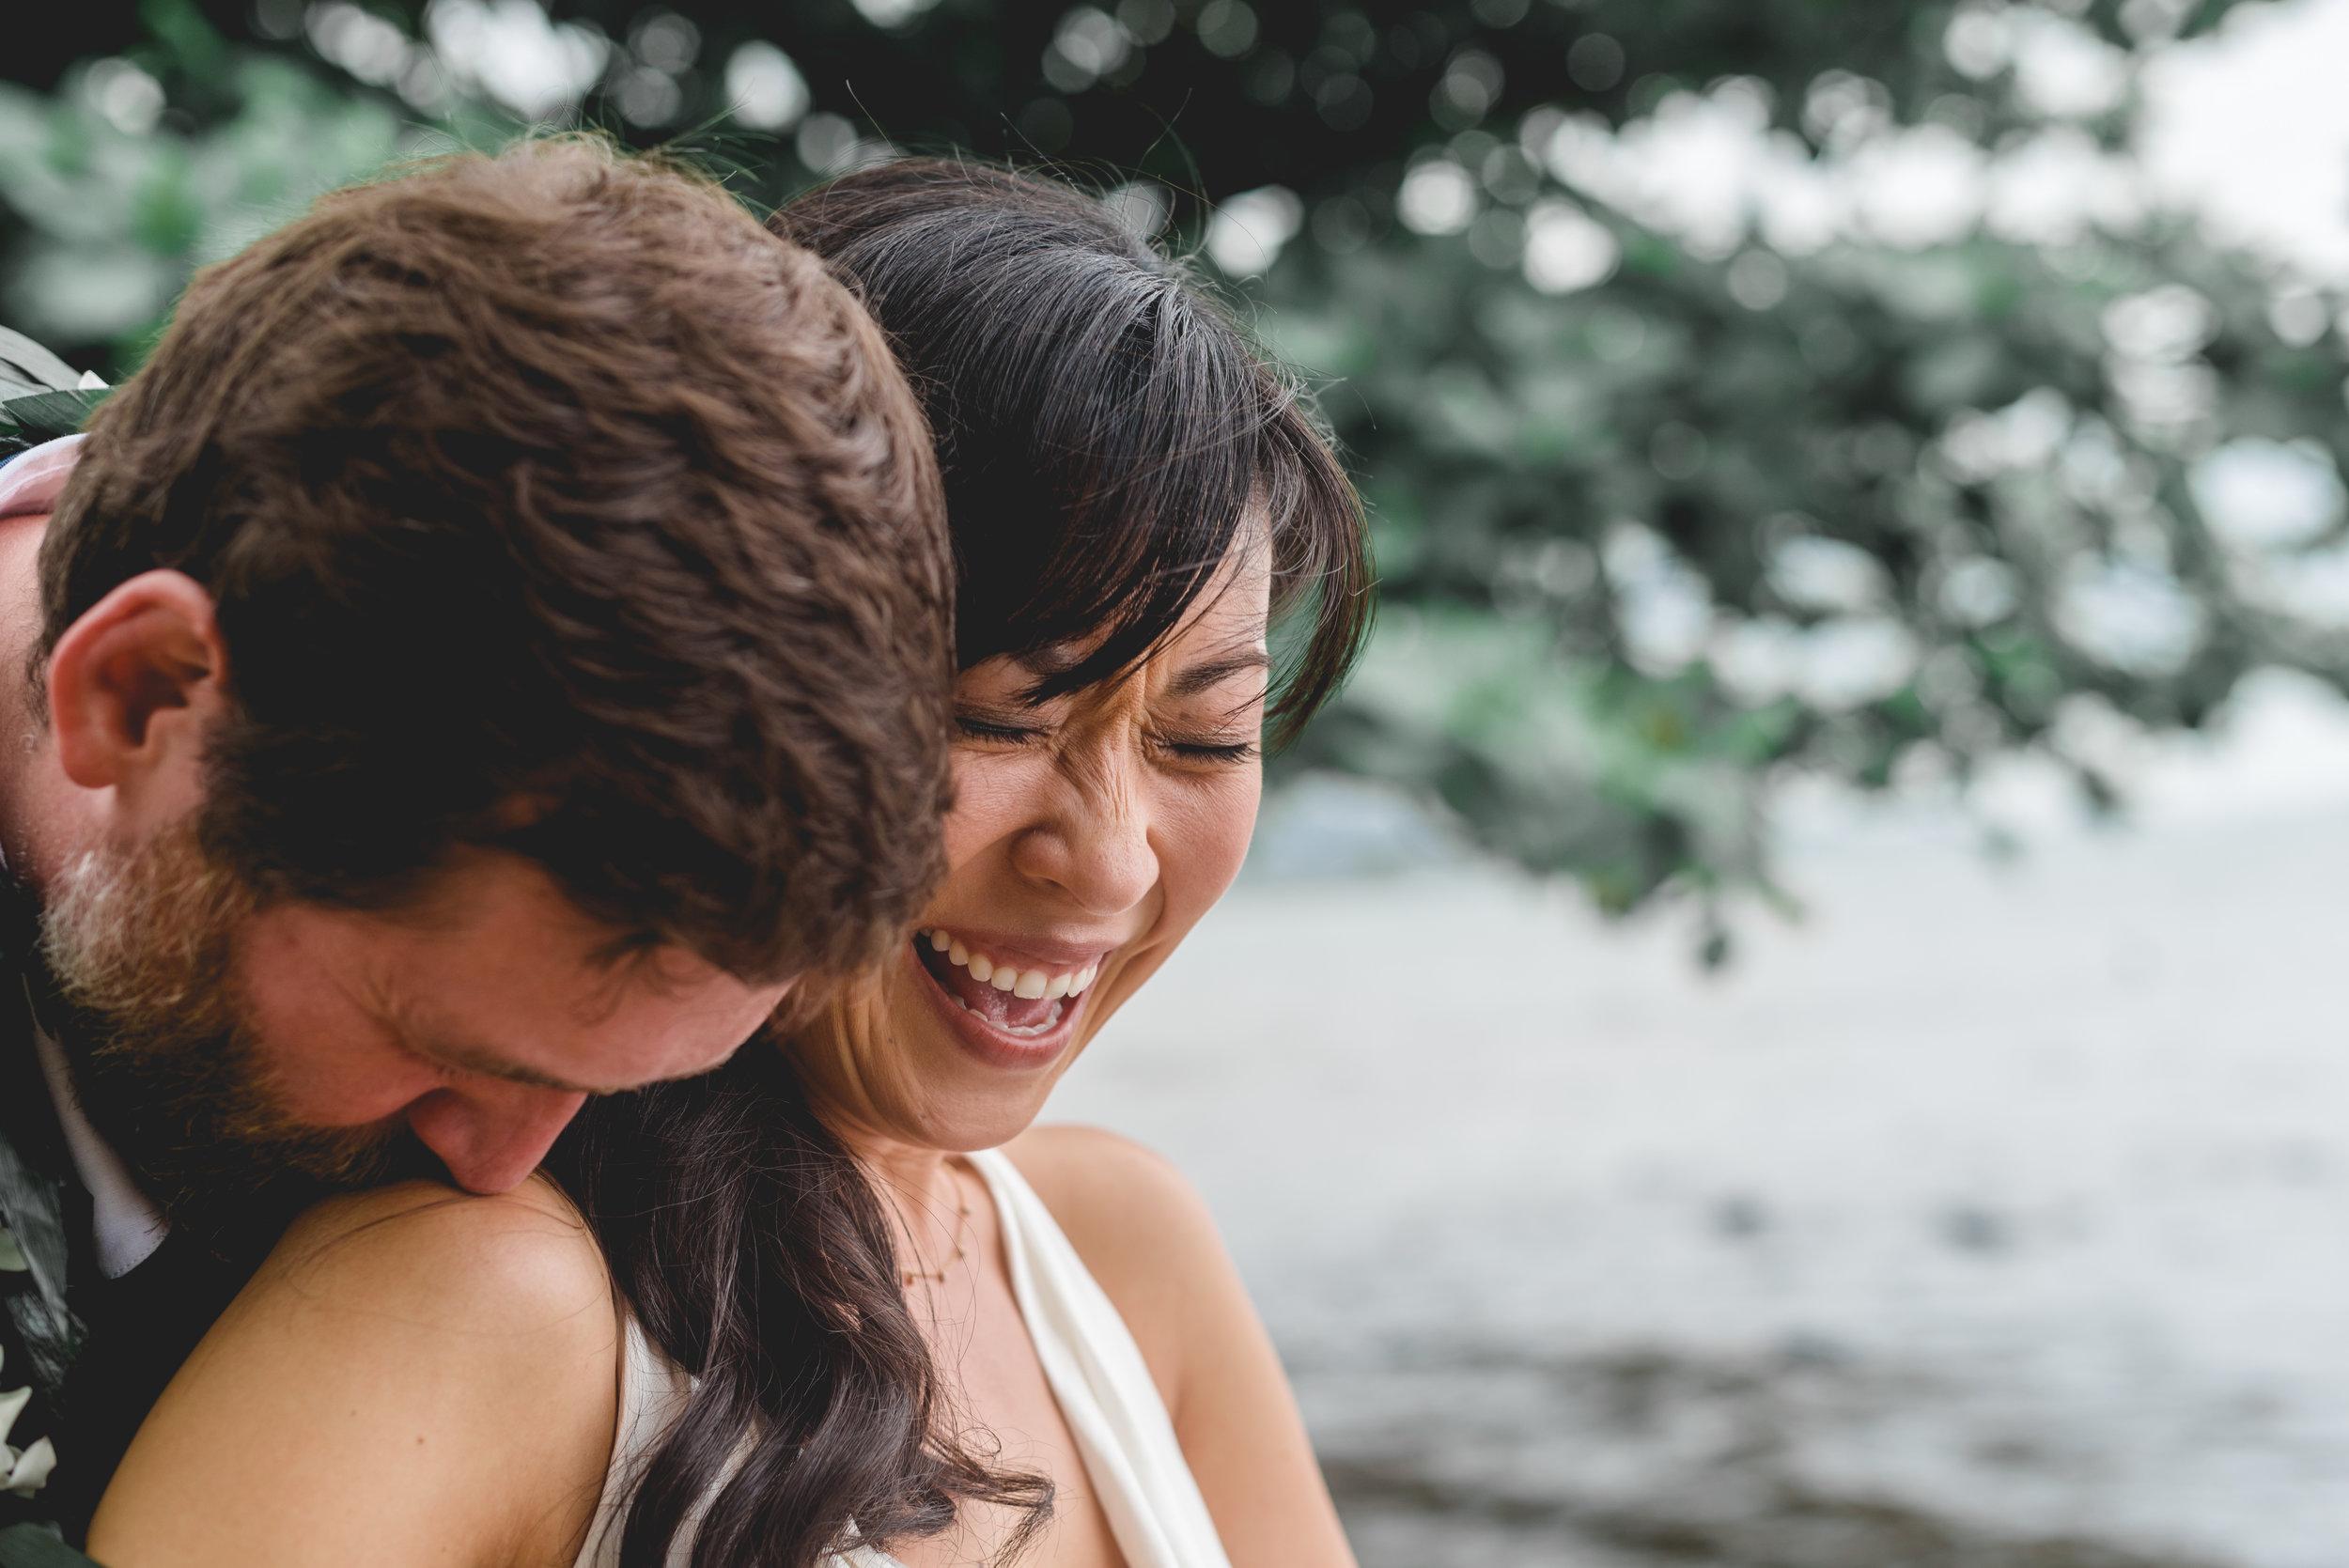 burns_deruntz-wedding-couple-105.jpg